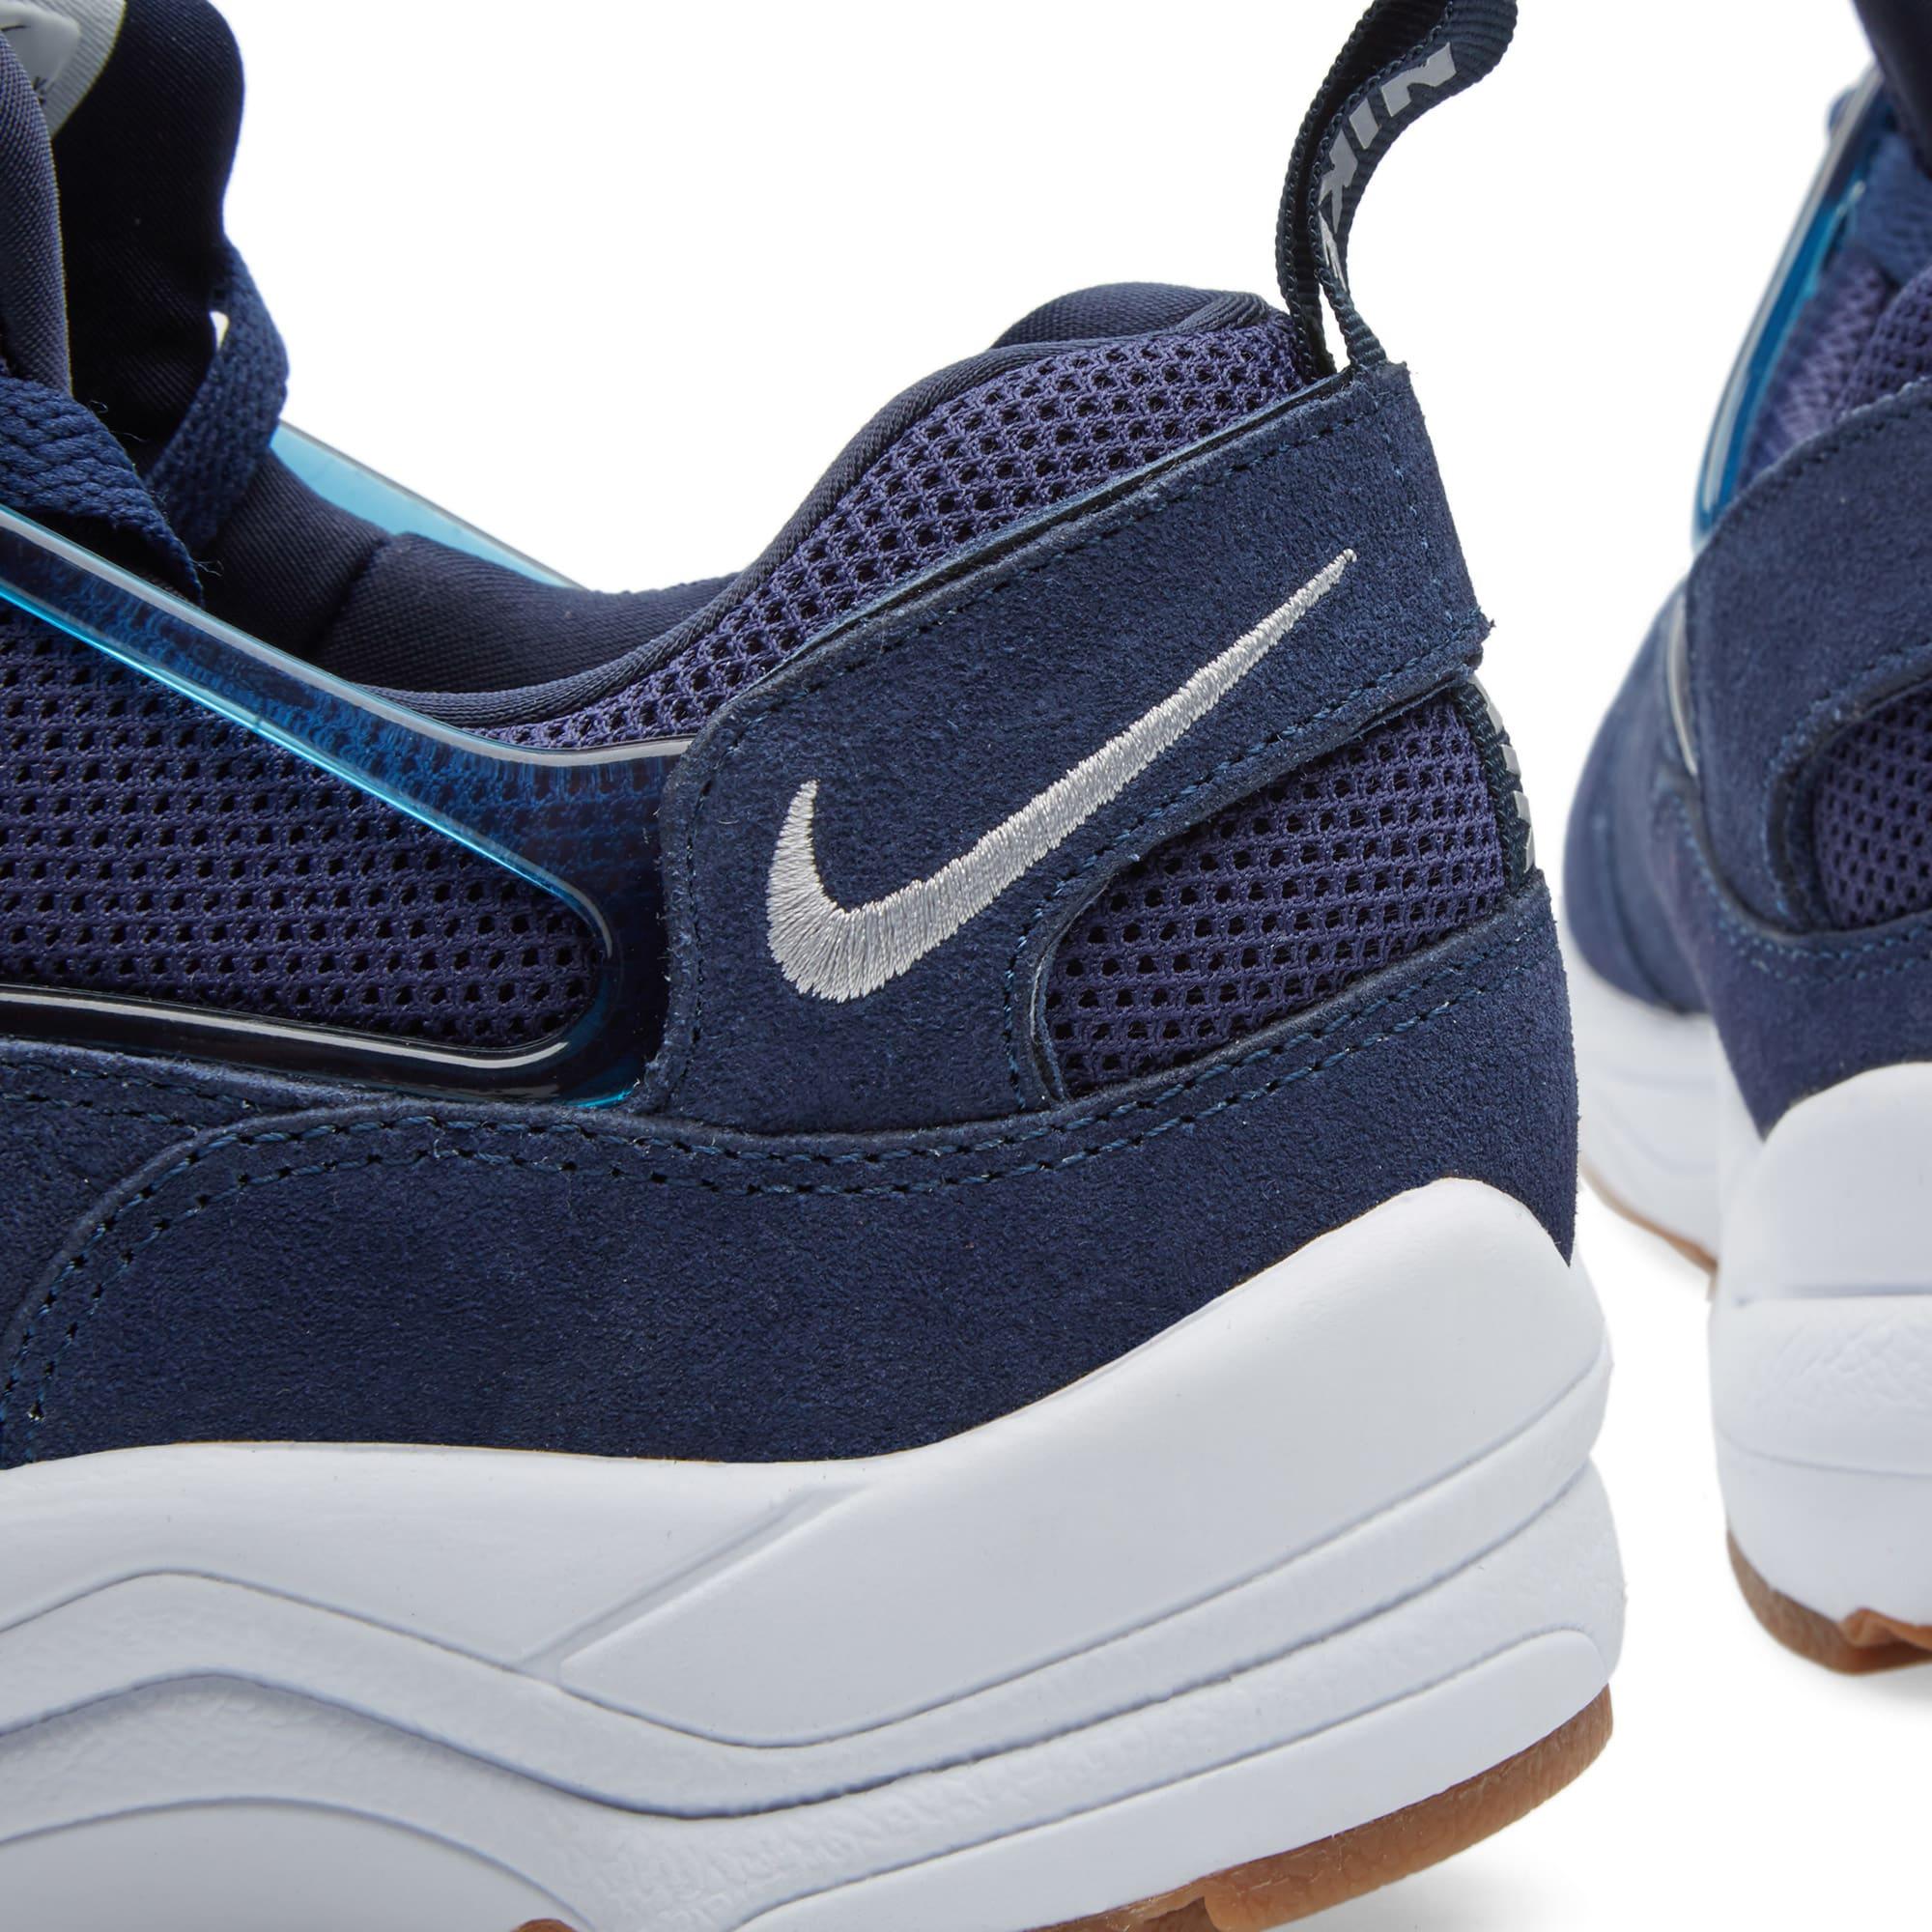 competitive price 7139d 90894 Nike Air Huarache Light